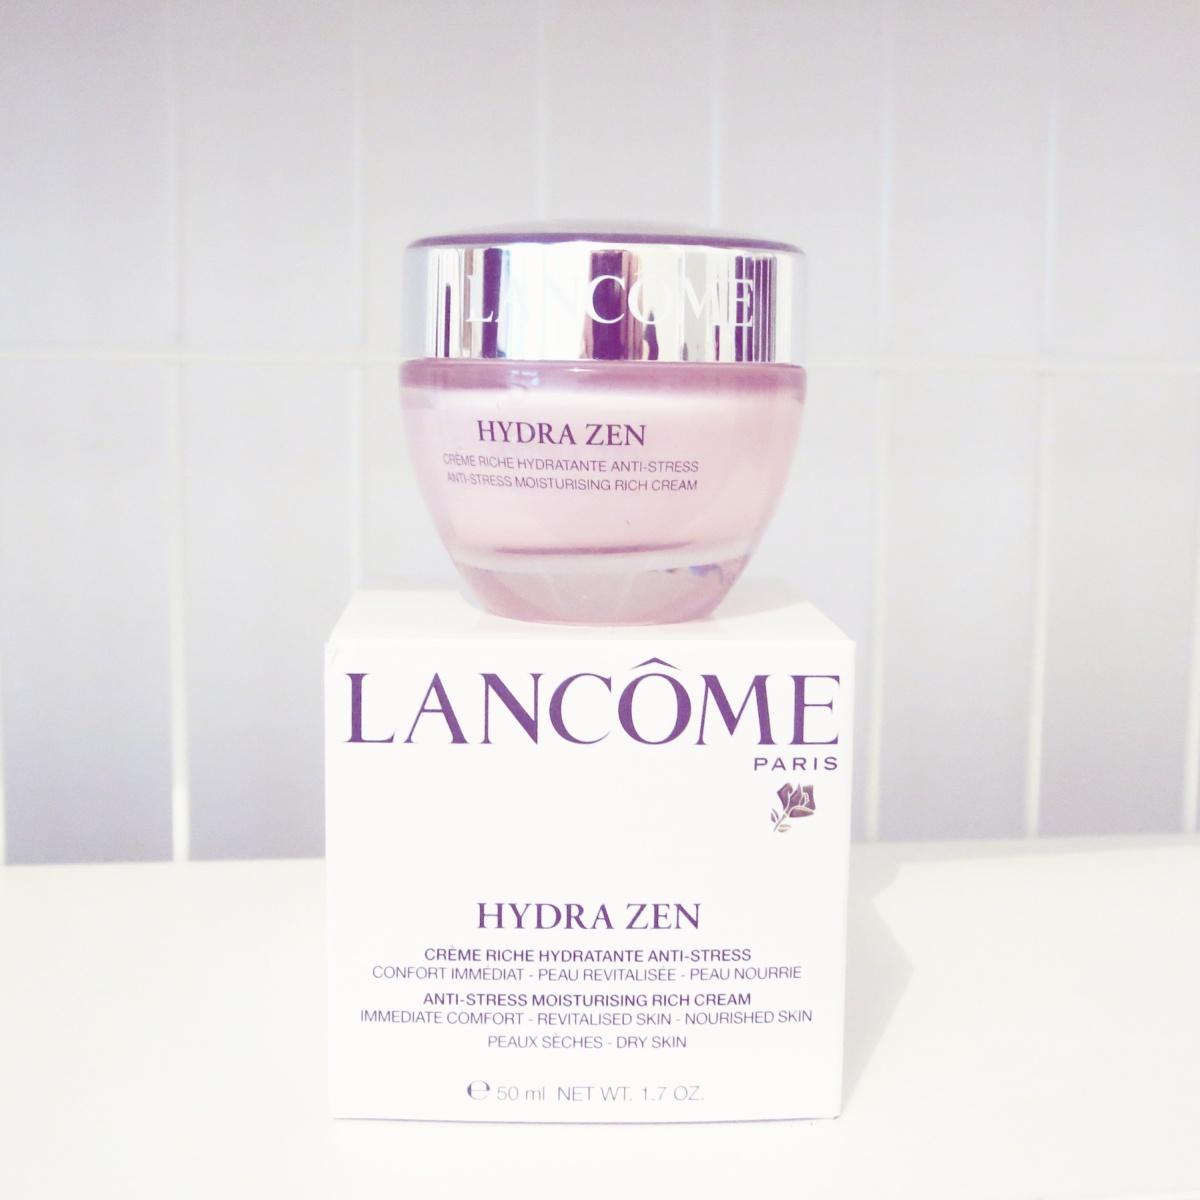 lancome_hydra_zen_leluxedaxelle_1